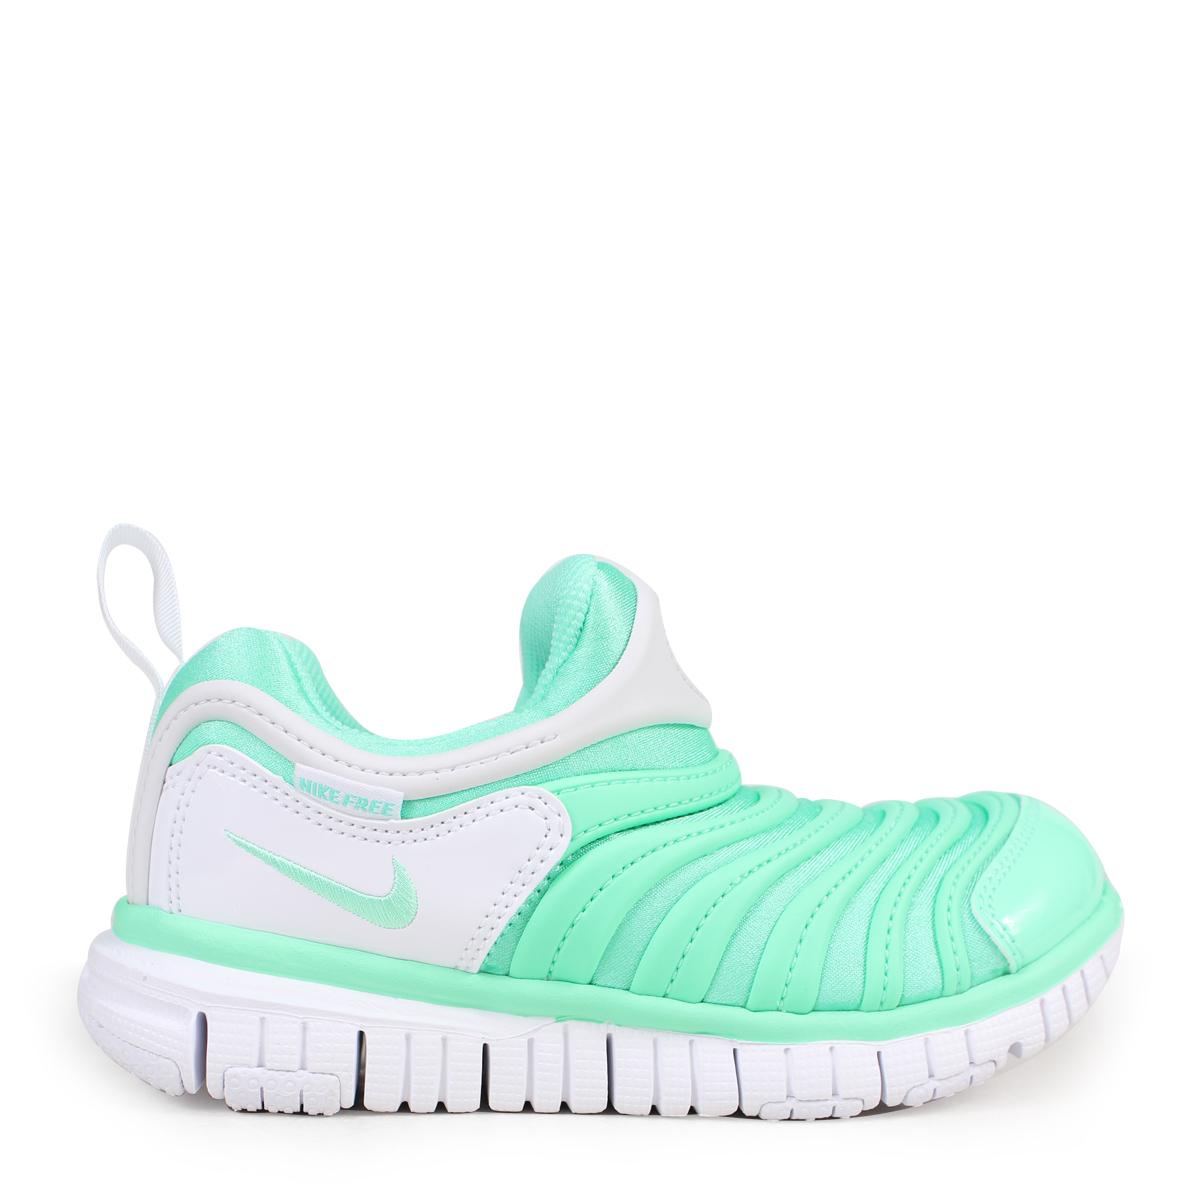 best service 89417 ebd7b ... NIKE DYNAMO FREE PS Nike dynamo-free kids sneakers 343,738-309 green  3  ...